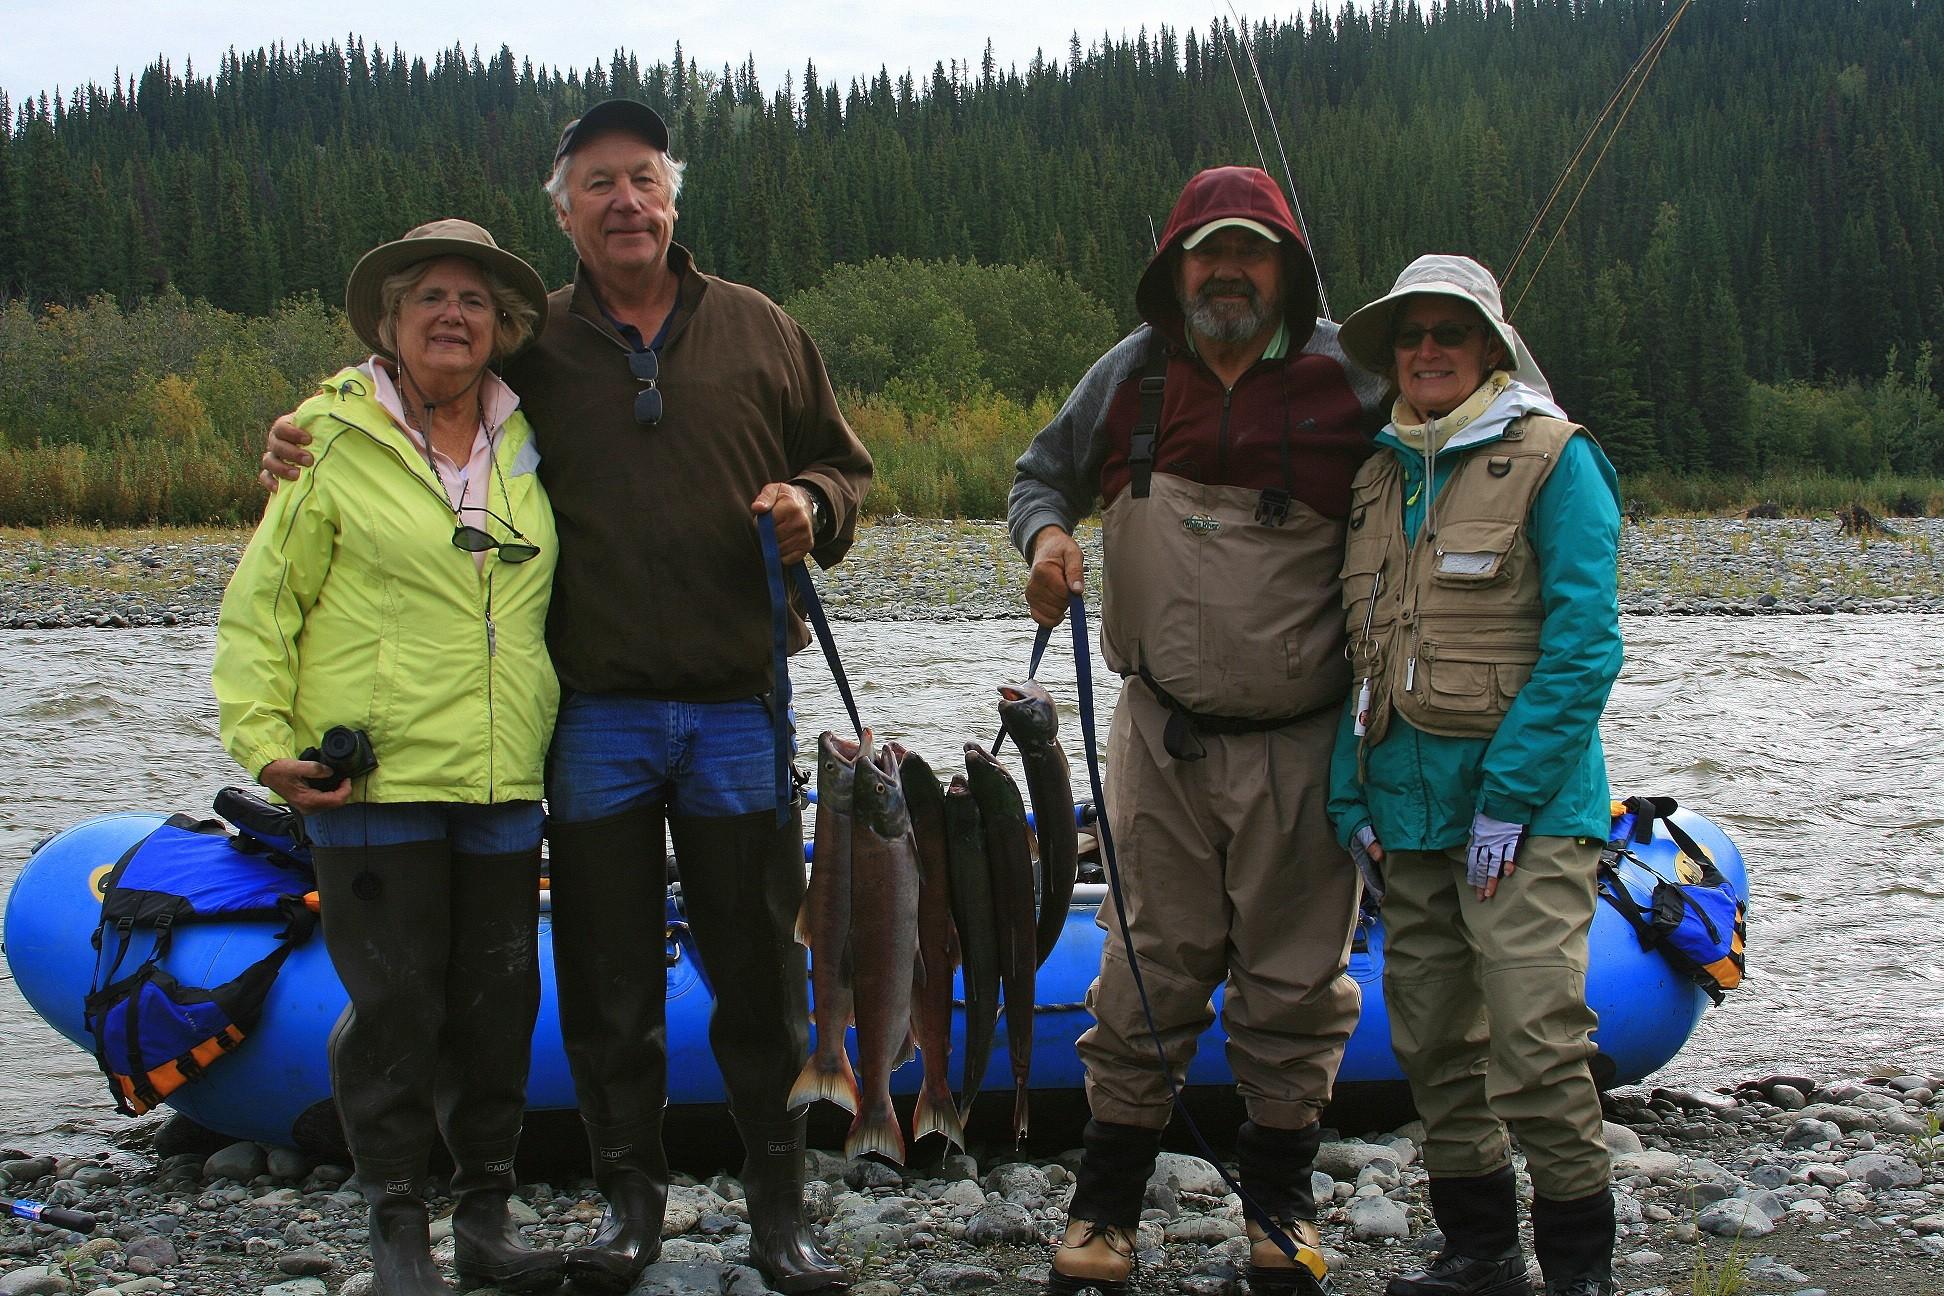 fly fishing, Gulkana River, Alaska, river, rafting, salmon fishing, Sockeye Salmon, Red Salmon,